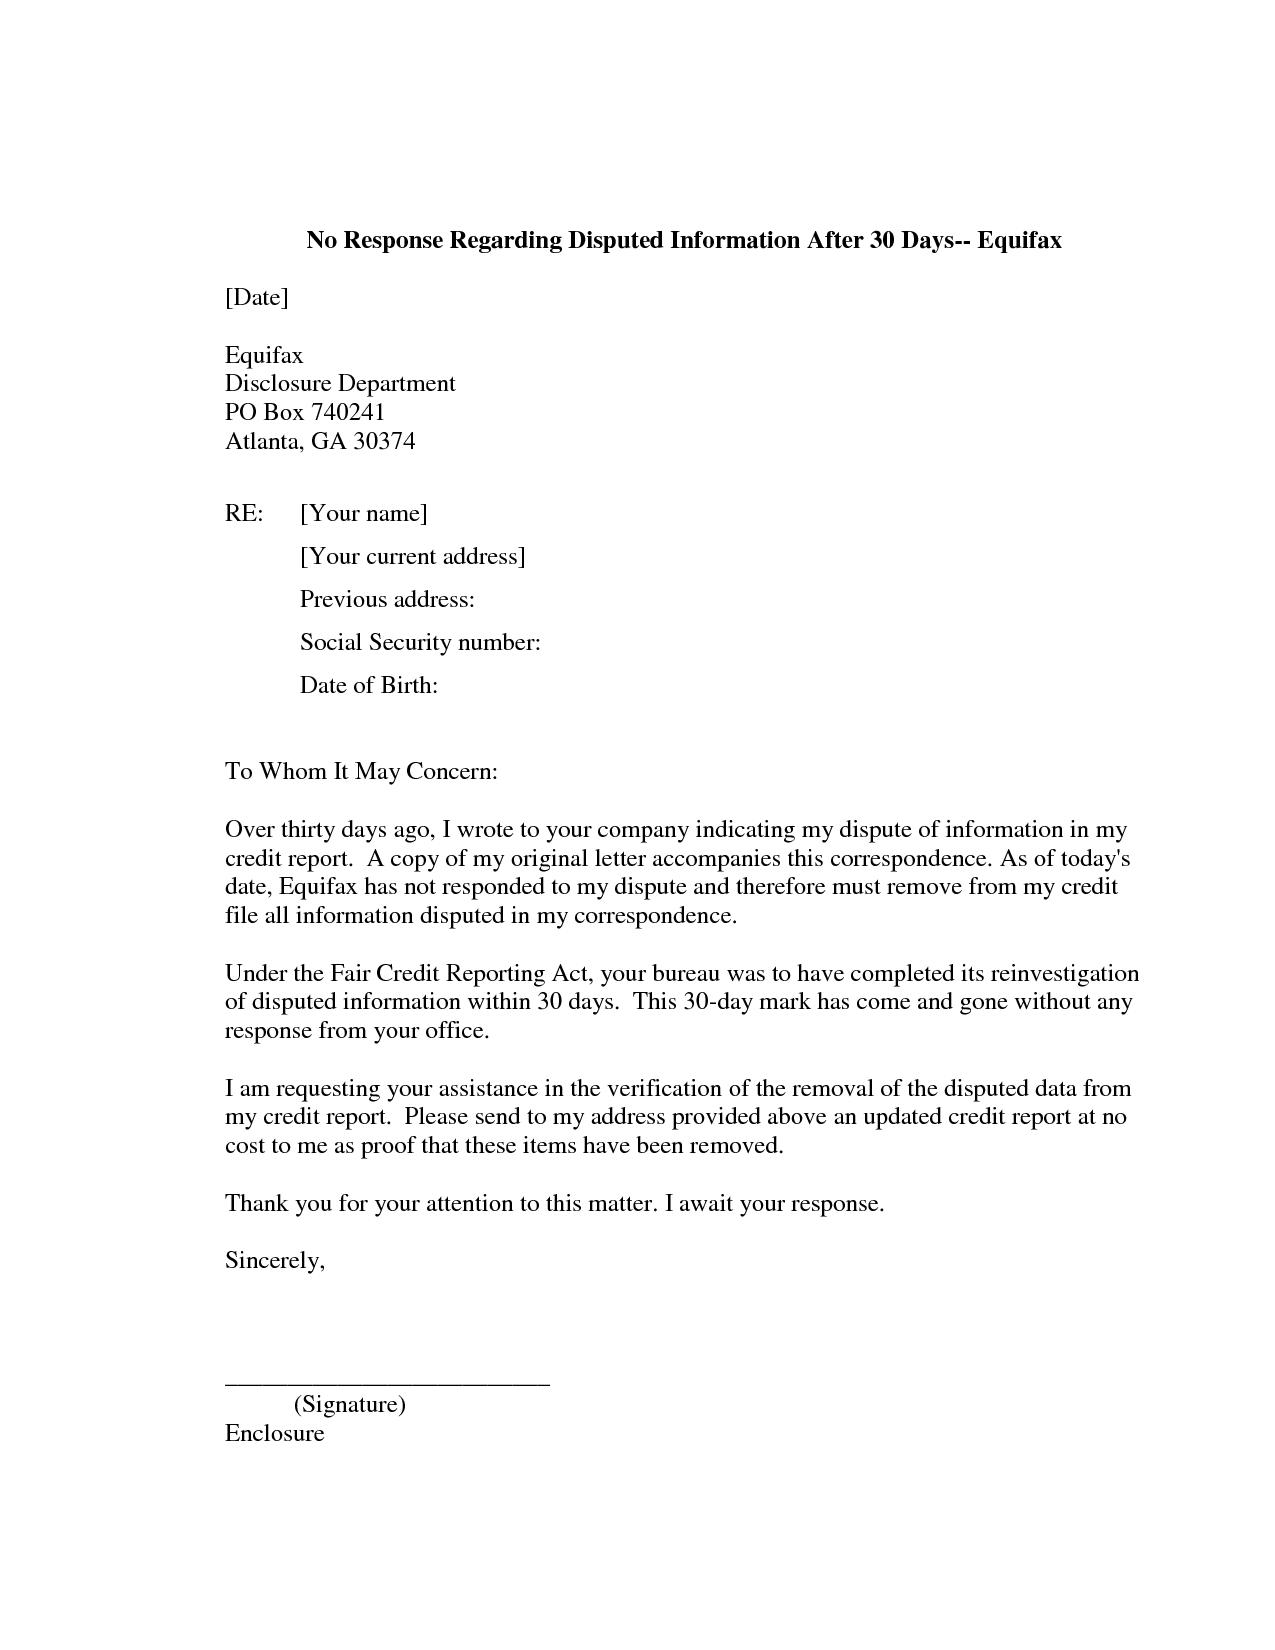 Repossession Dispute Letter Template - Credit Dispute Letter Template Credit Repair Secrets Exposed